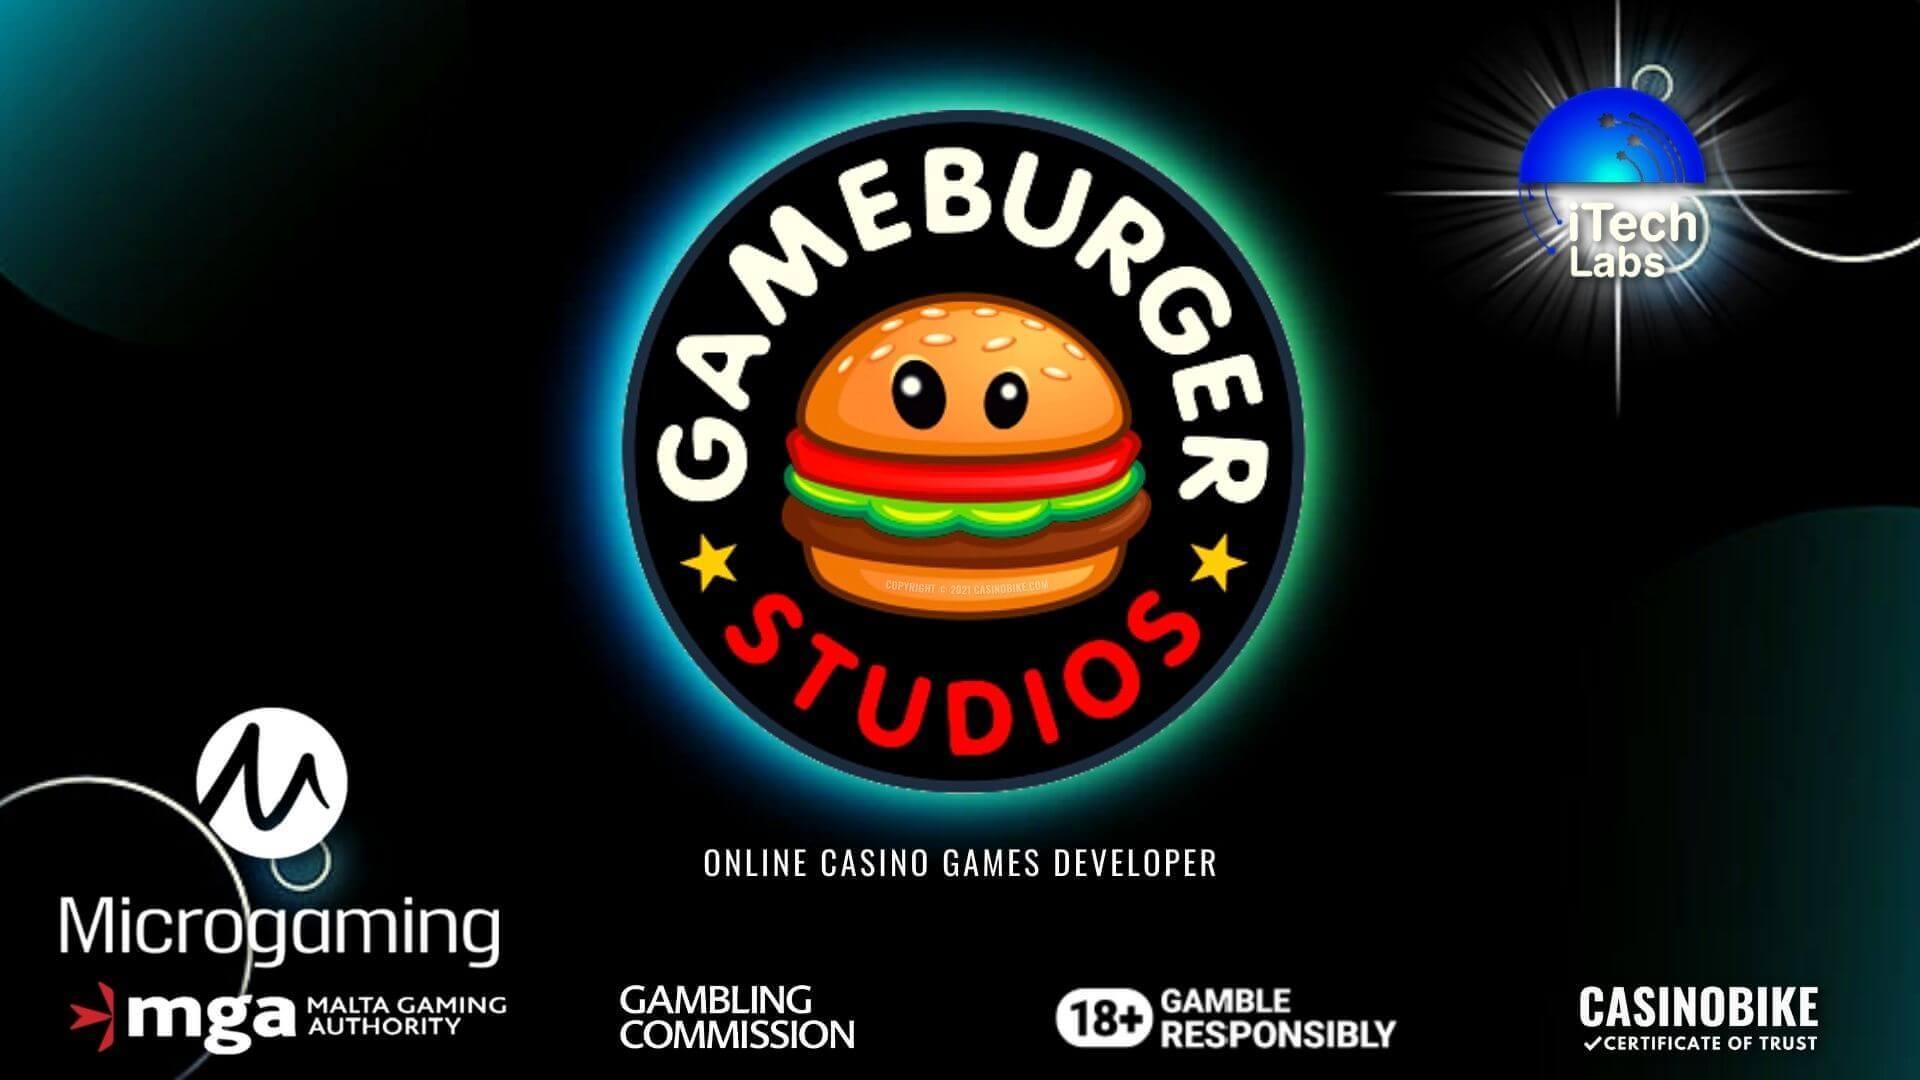 Gameburger Studios Online Casino Games Developer